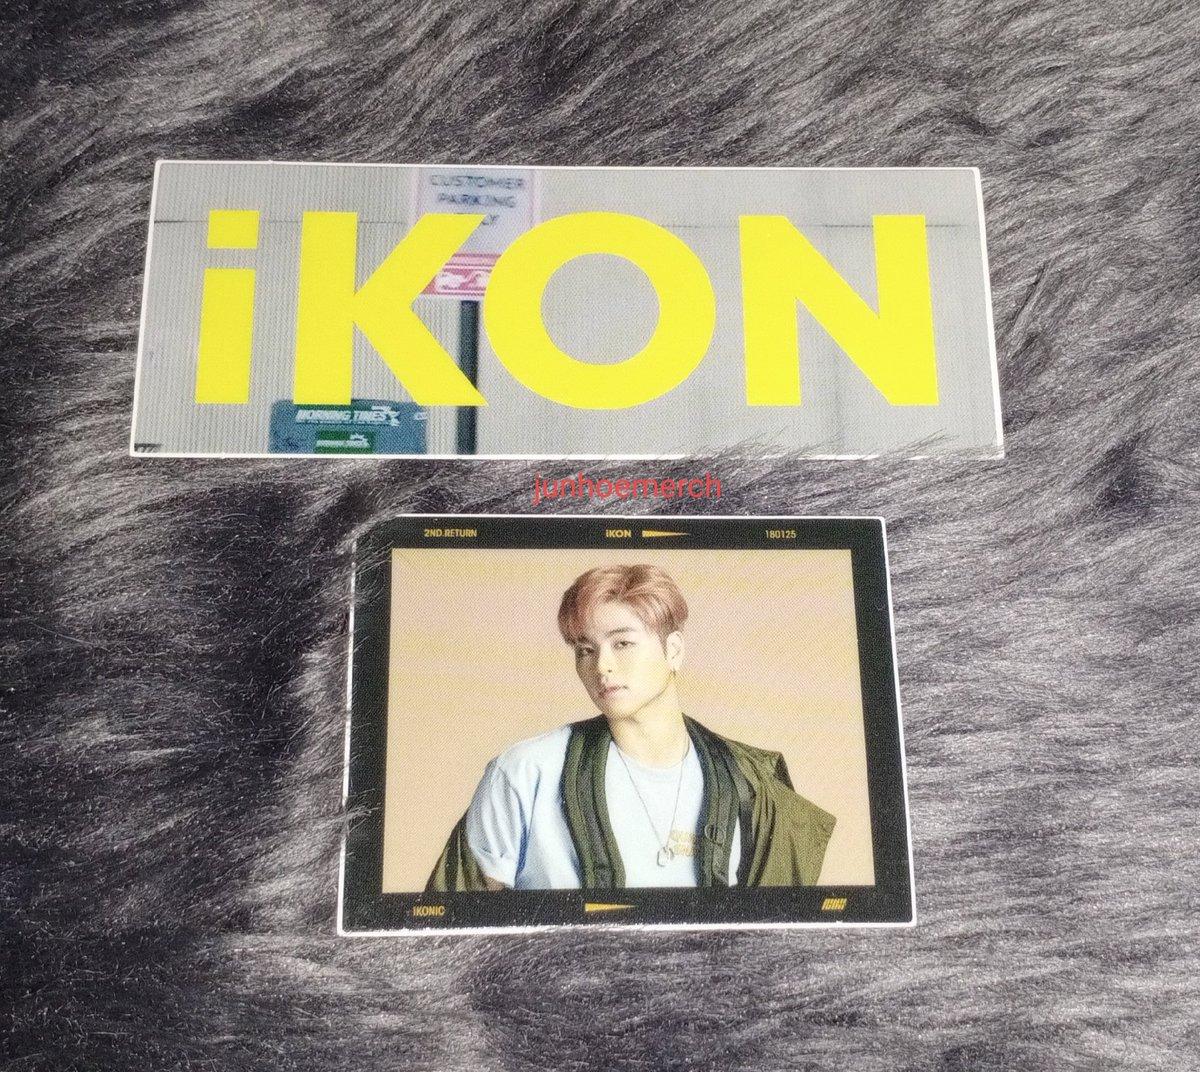 ♡ iKON Return Junhoe sticker ♡  @tkwpcnfak #iKON #JUNE #Junhoe